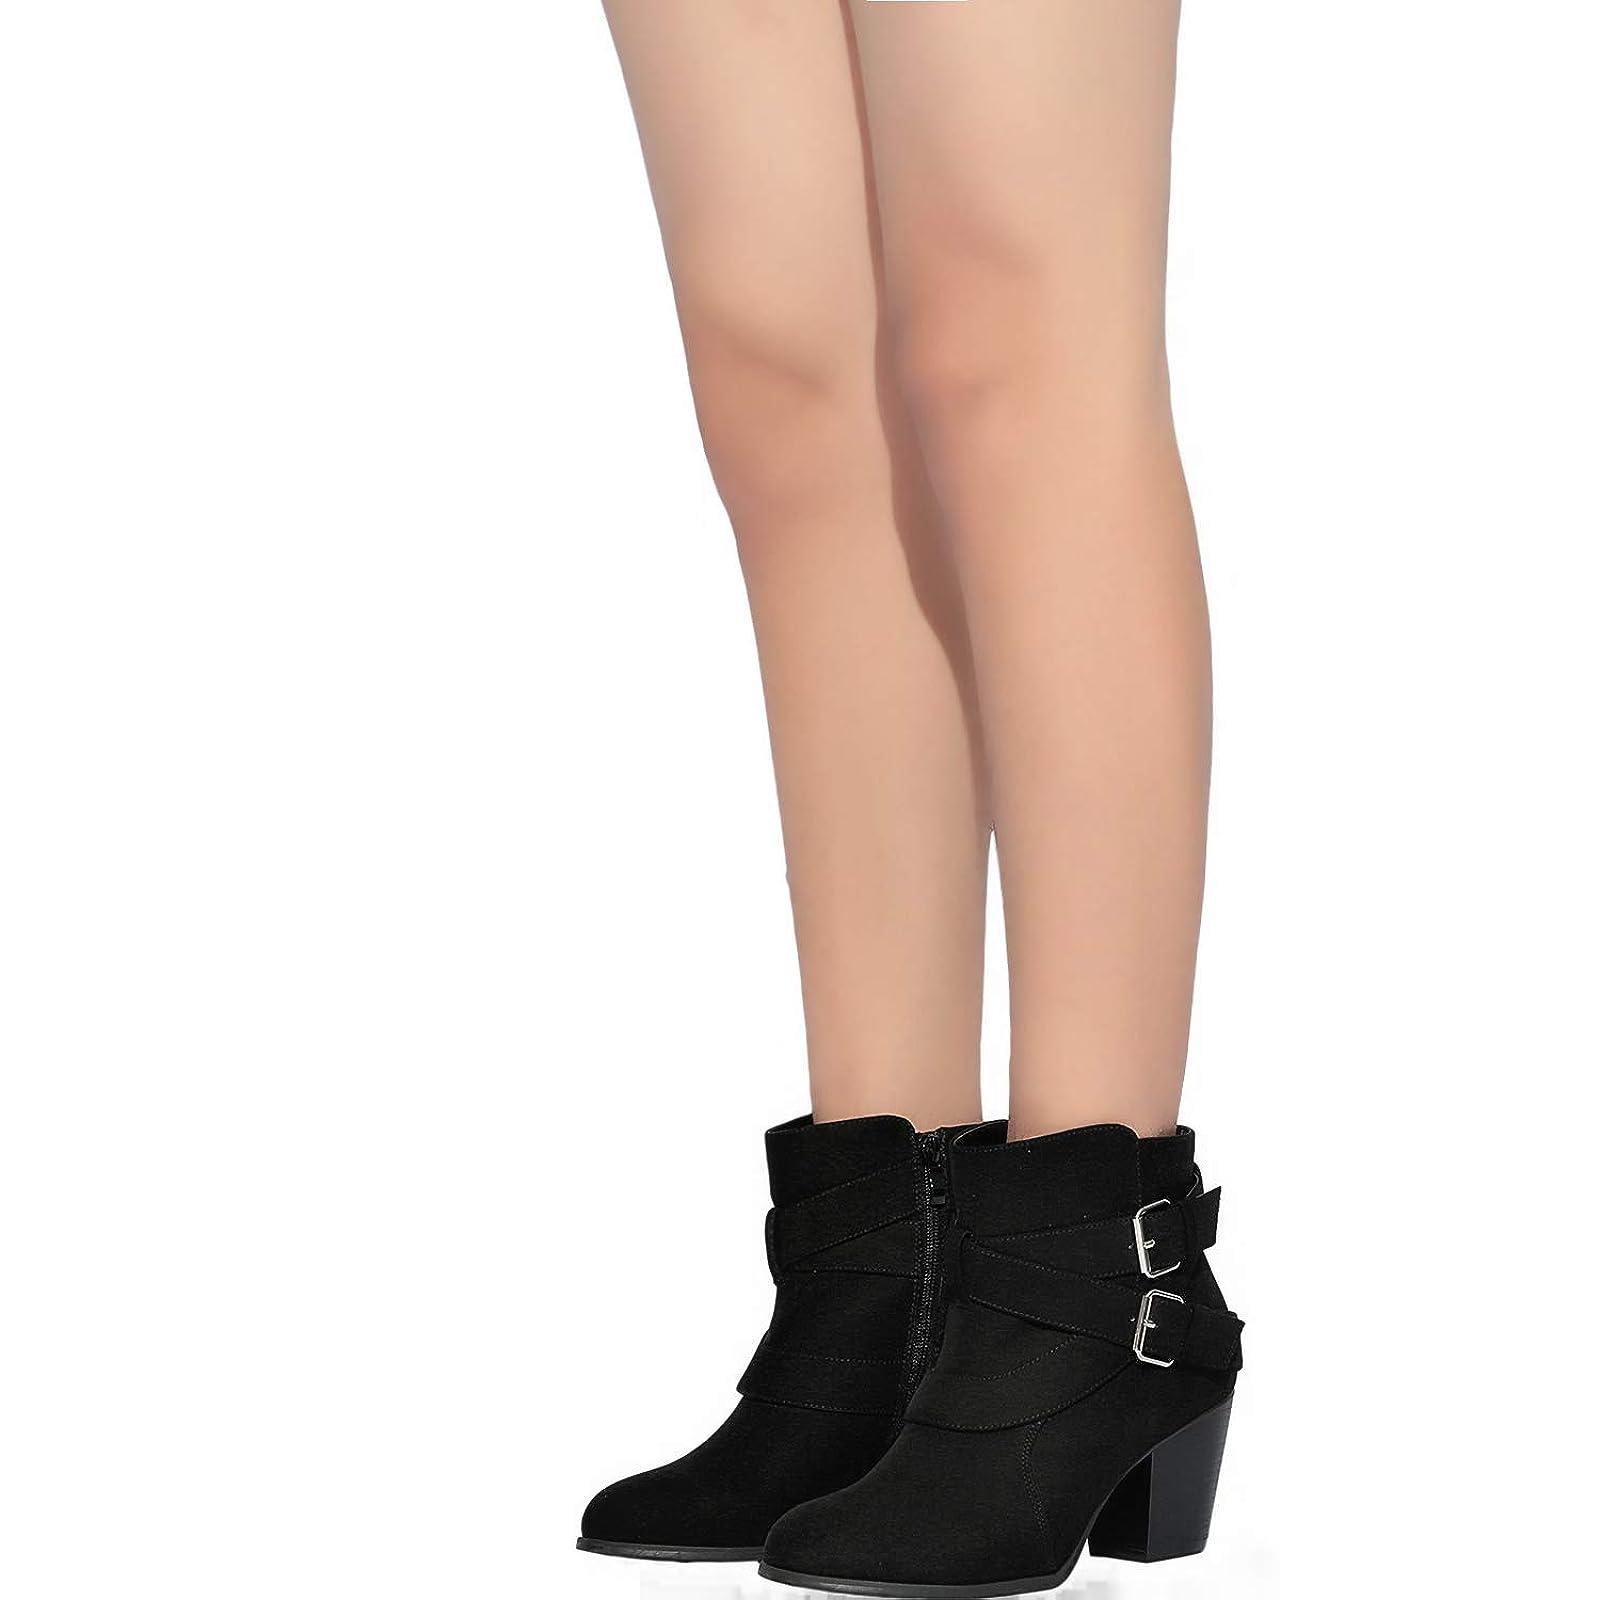 Luoika Women's Wide Width Ankle Boots - Black 10 XW US - 6